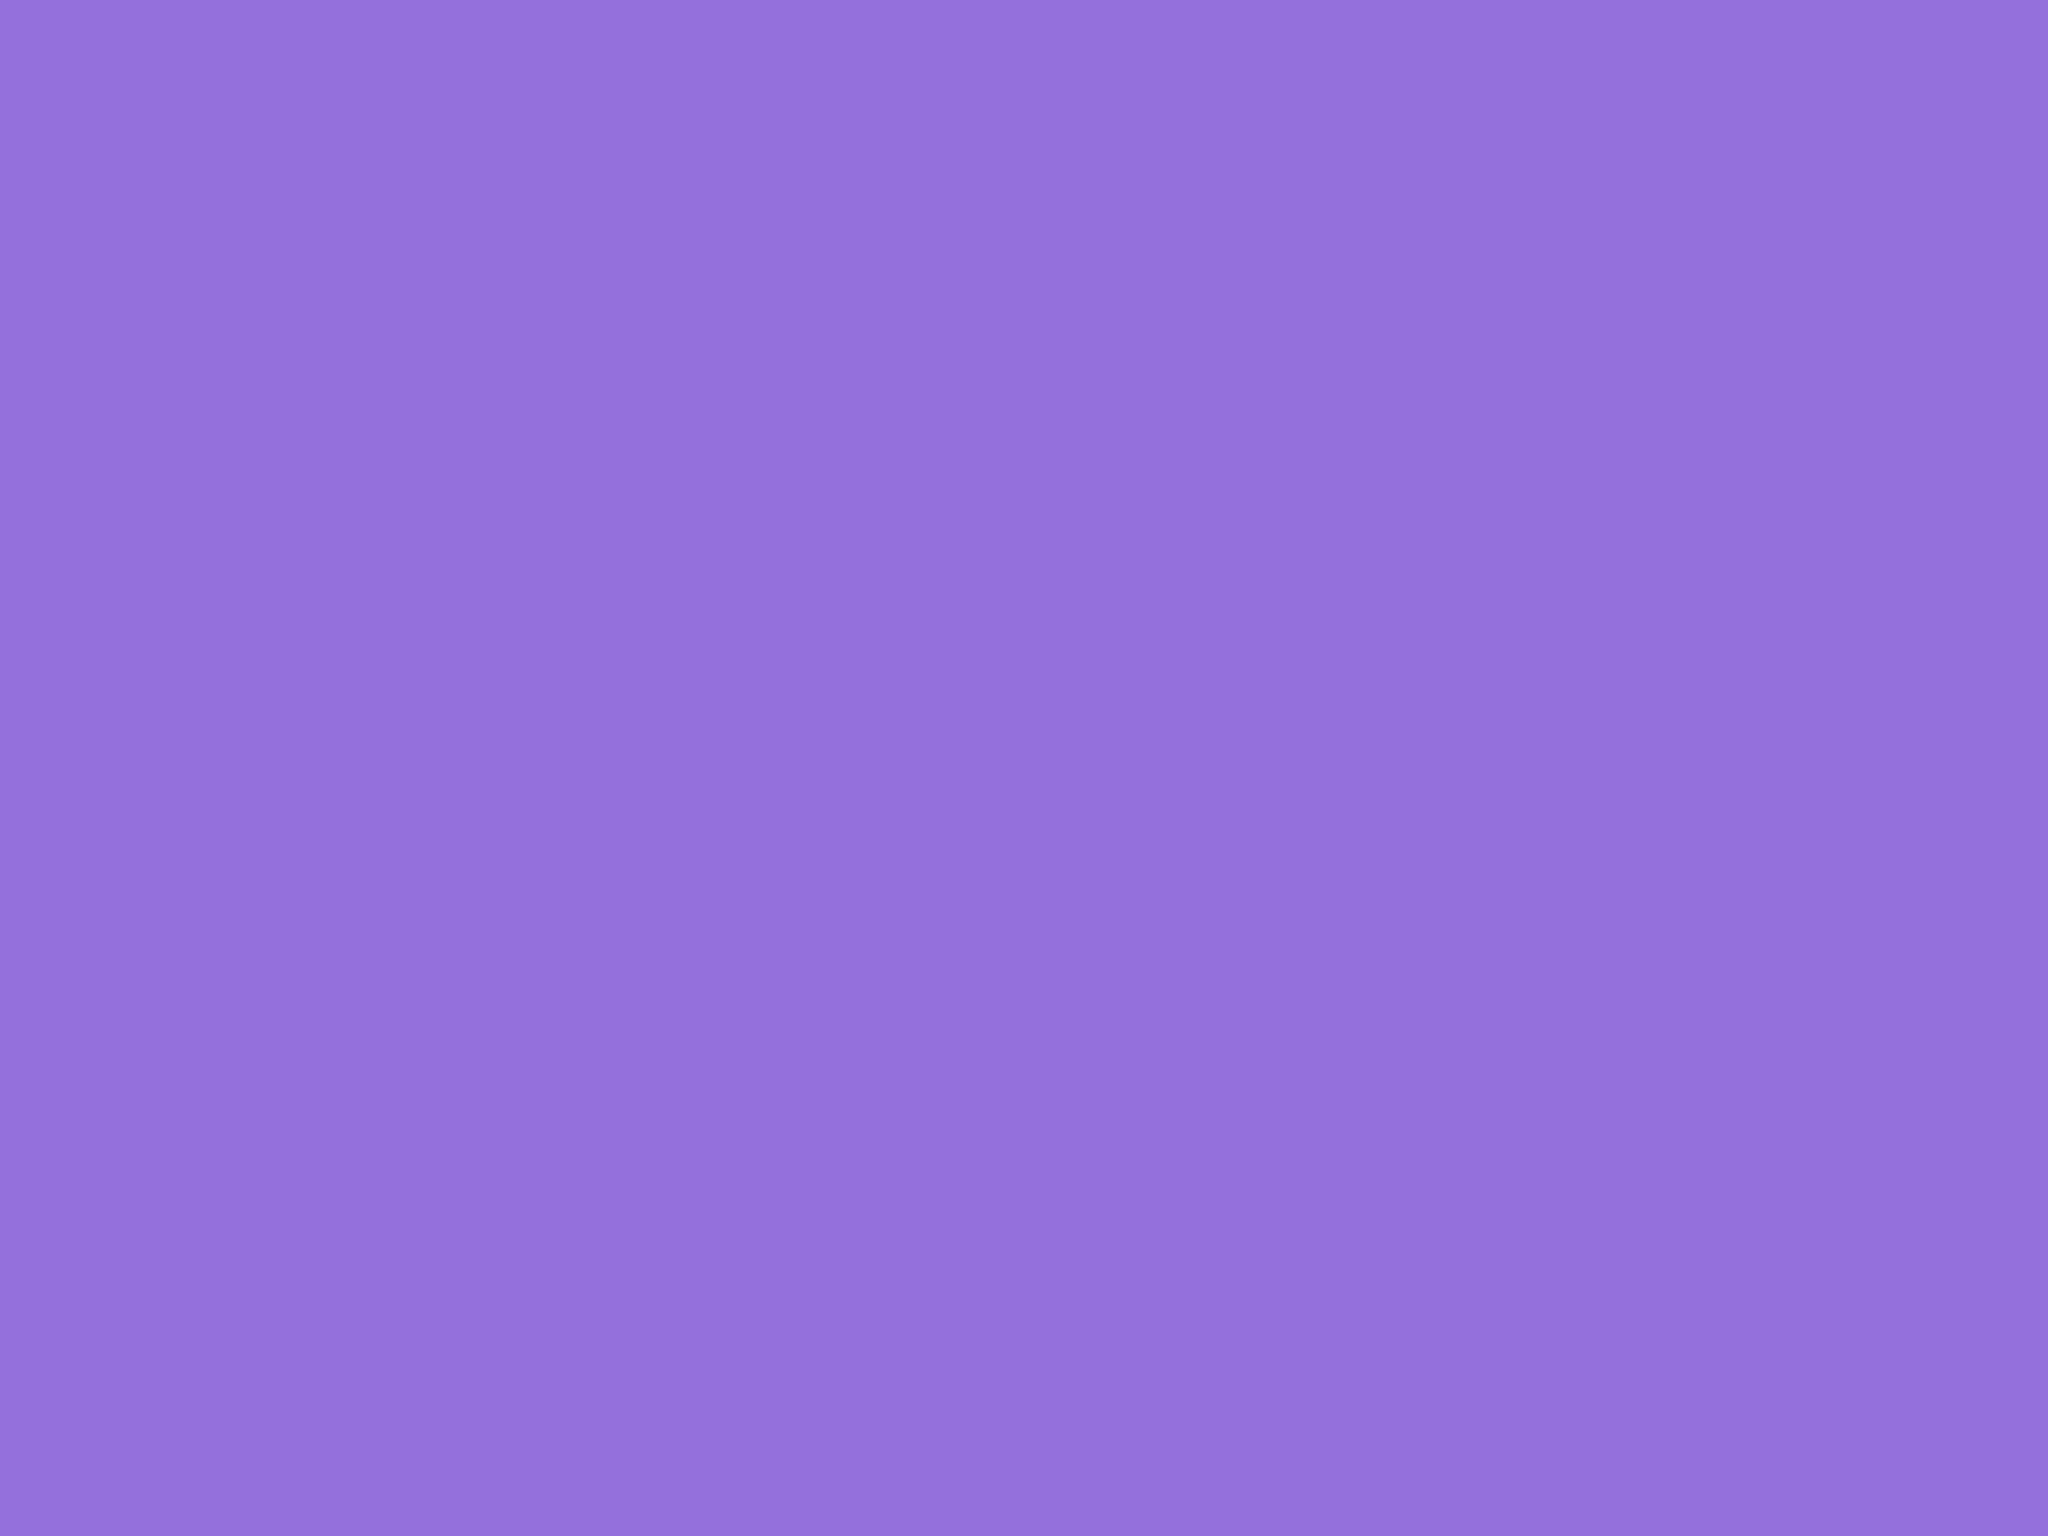 2048x1536 Medium Purple Solid Color Background